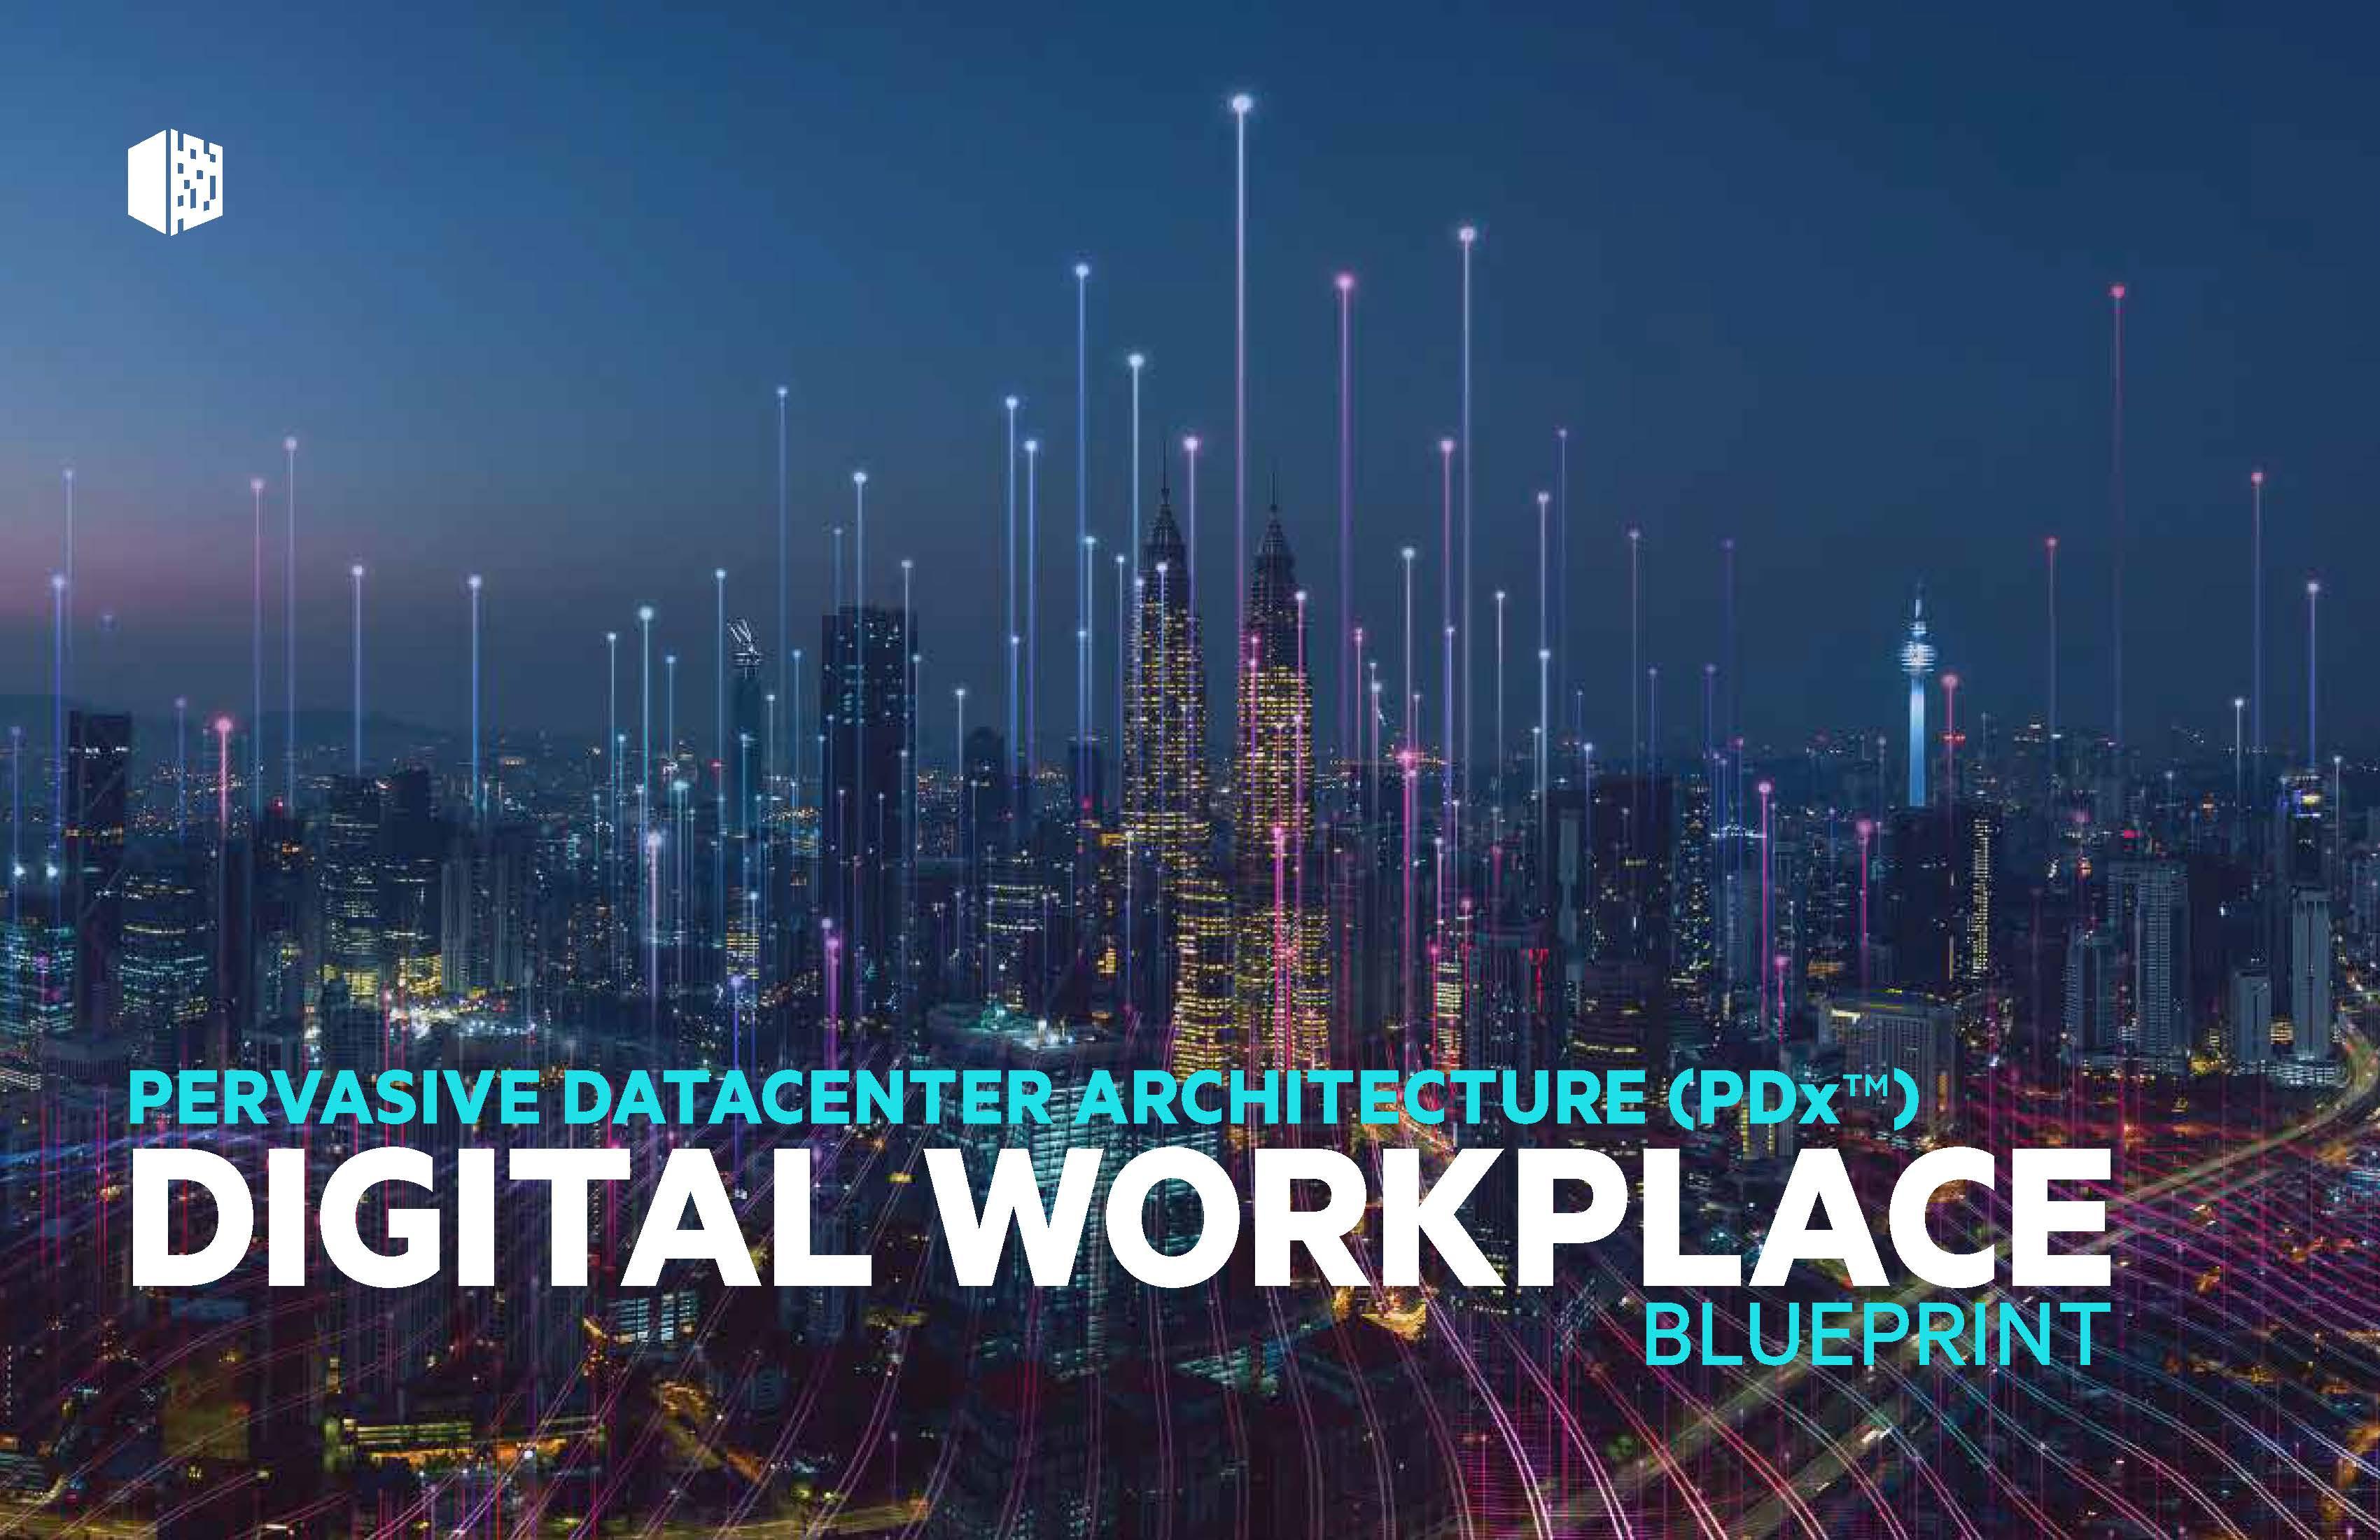 Digital Workplace Blueprint Schweiz